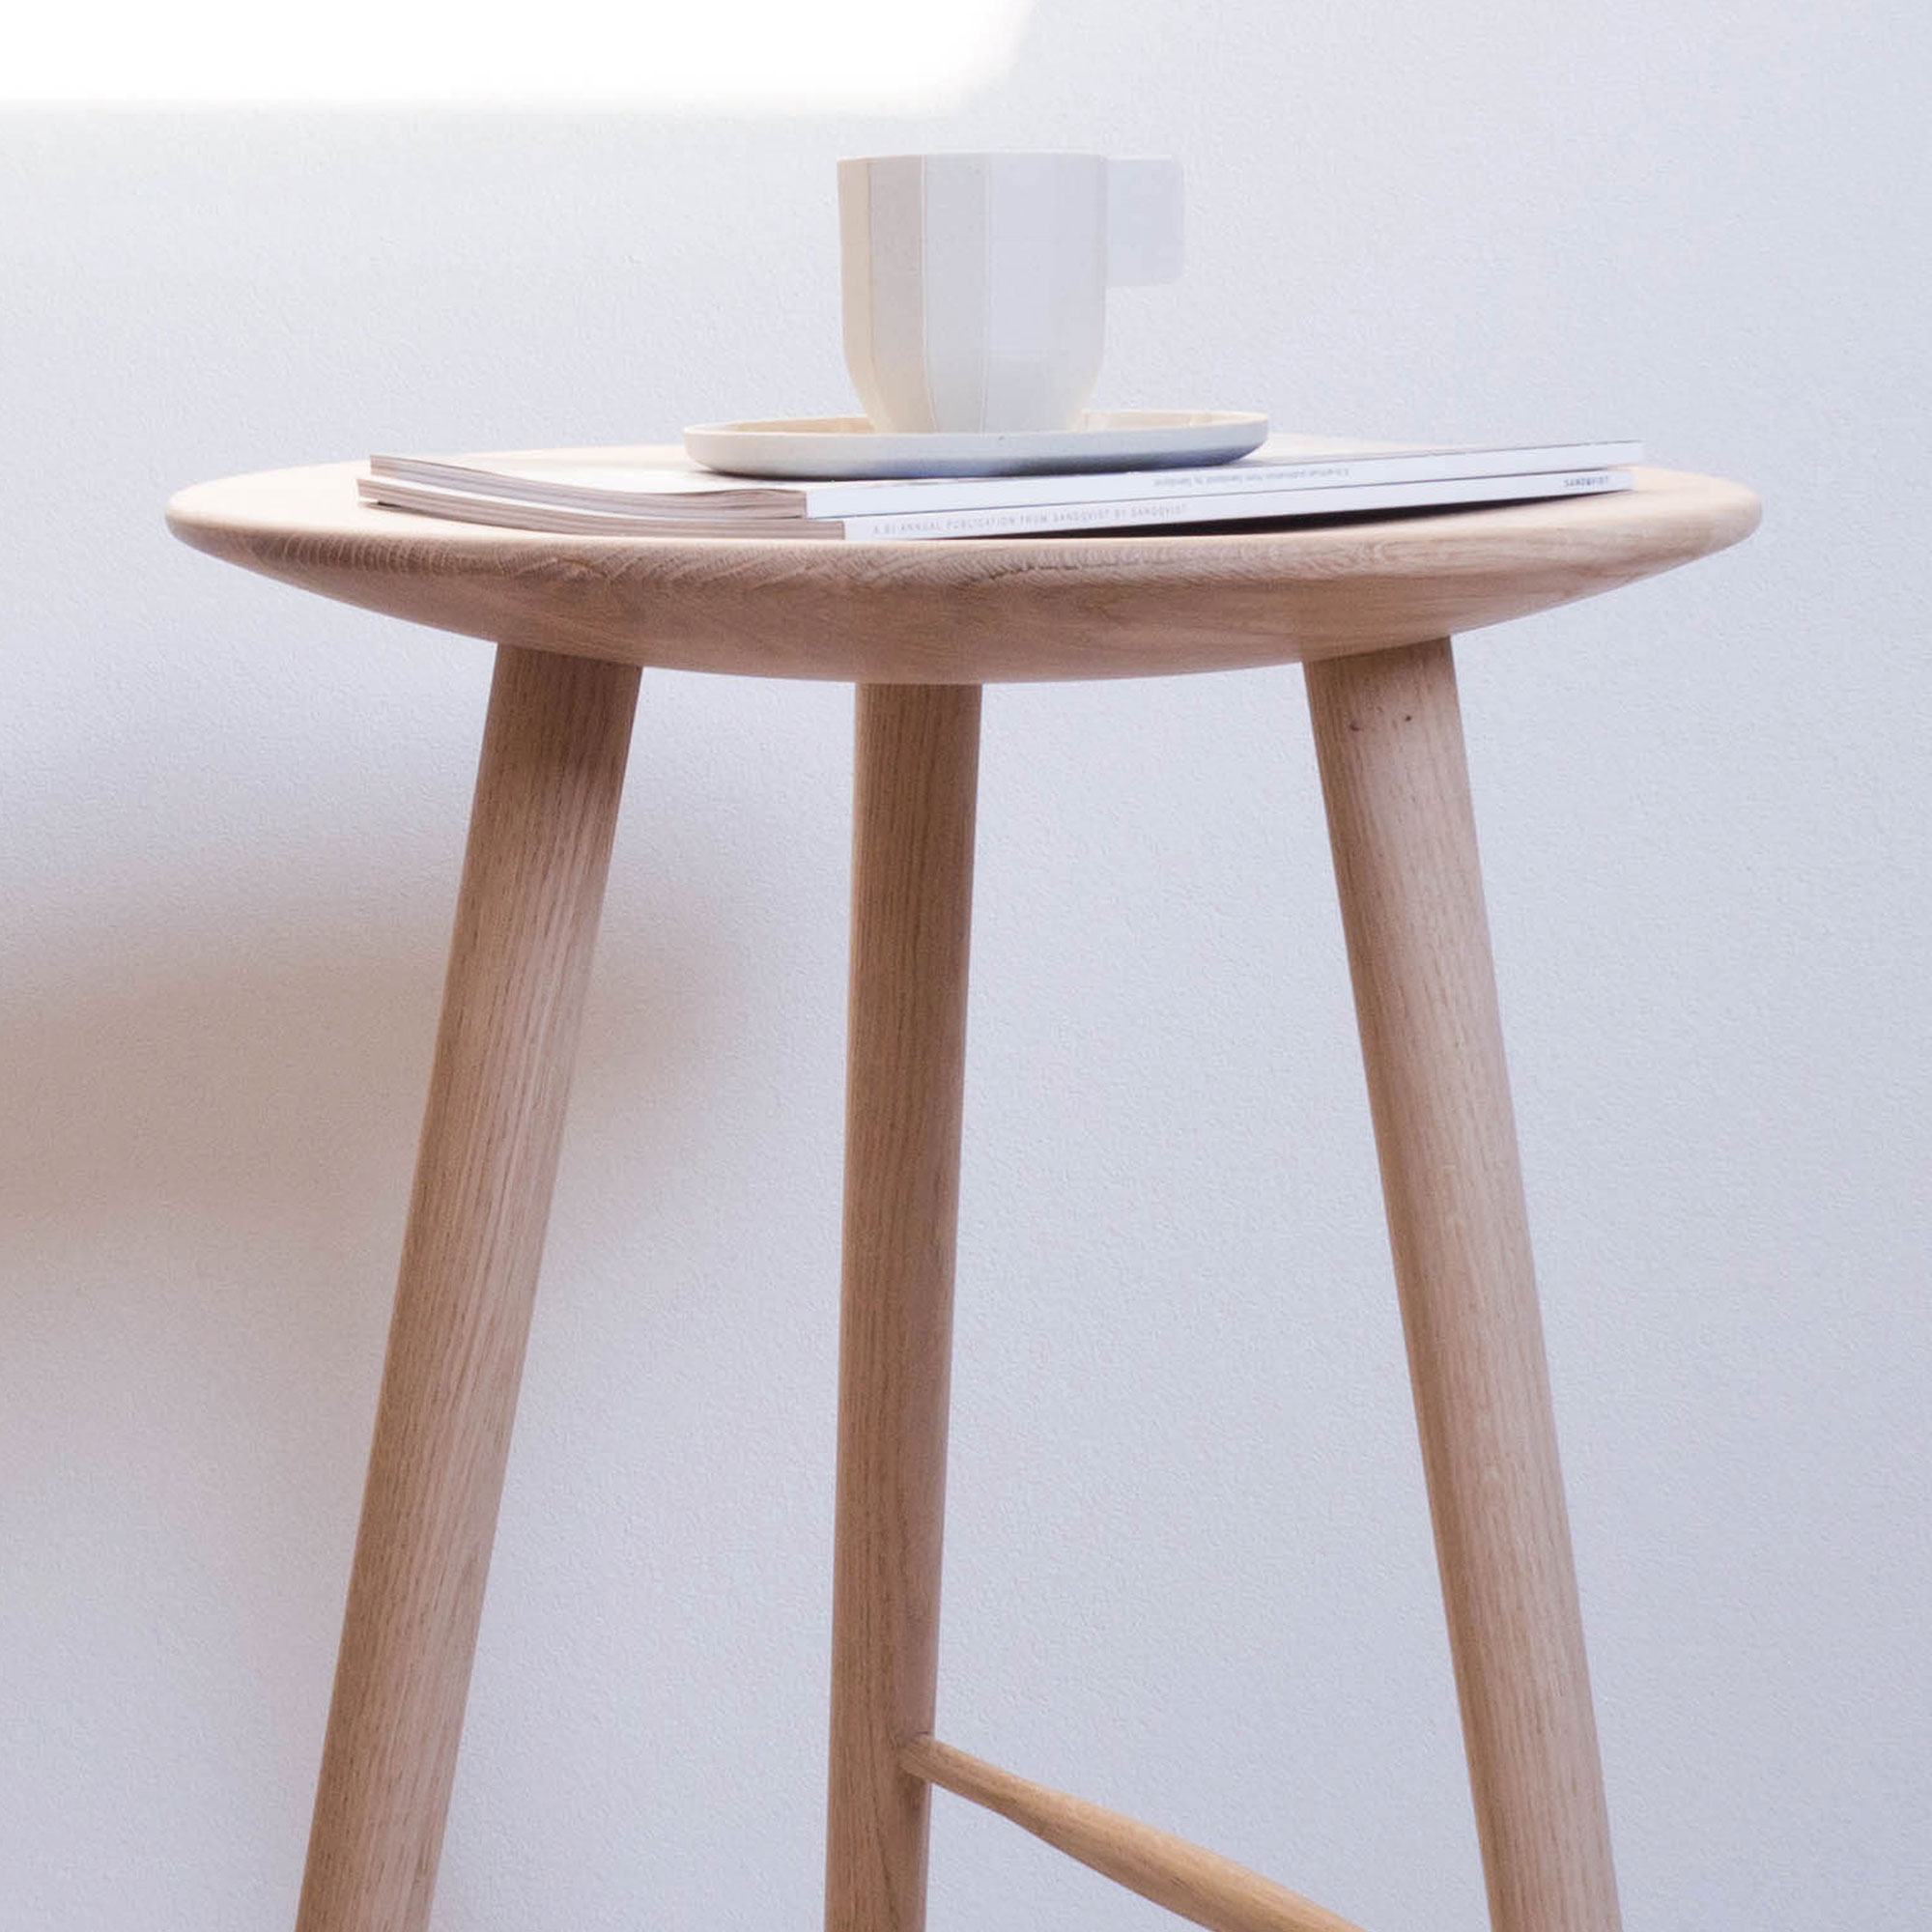 Barhocker Design design barhocker divolo aus holz ohne lehne applicata